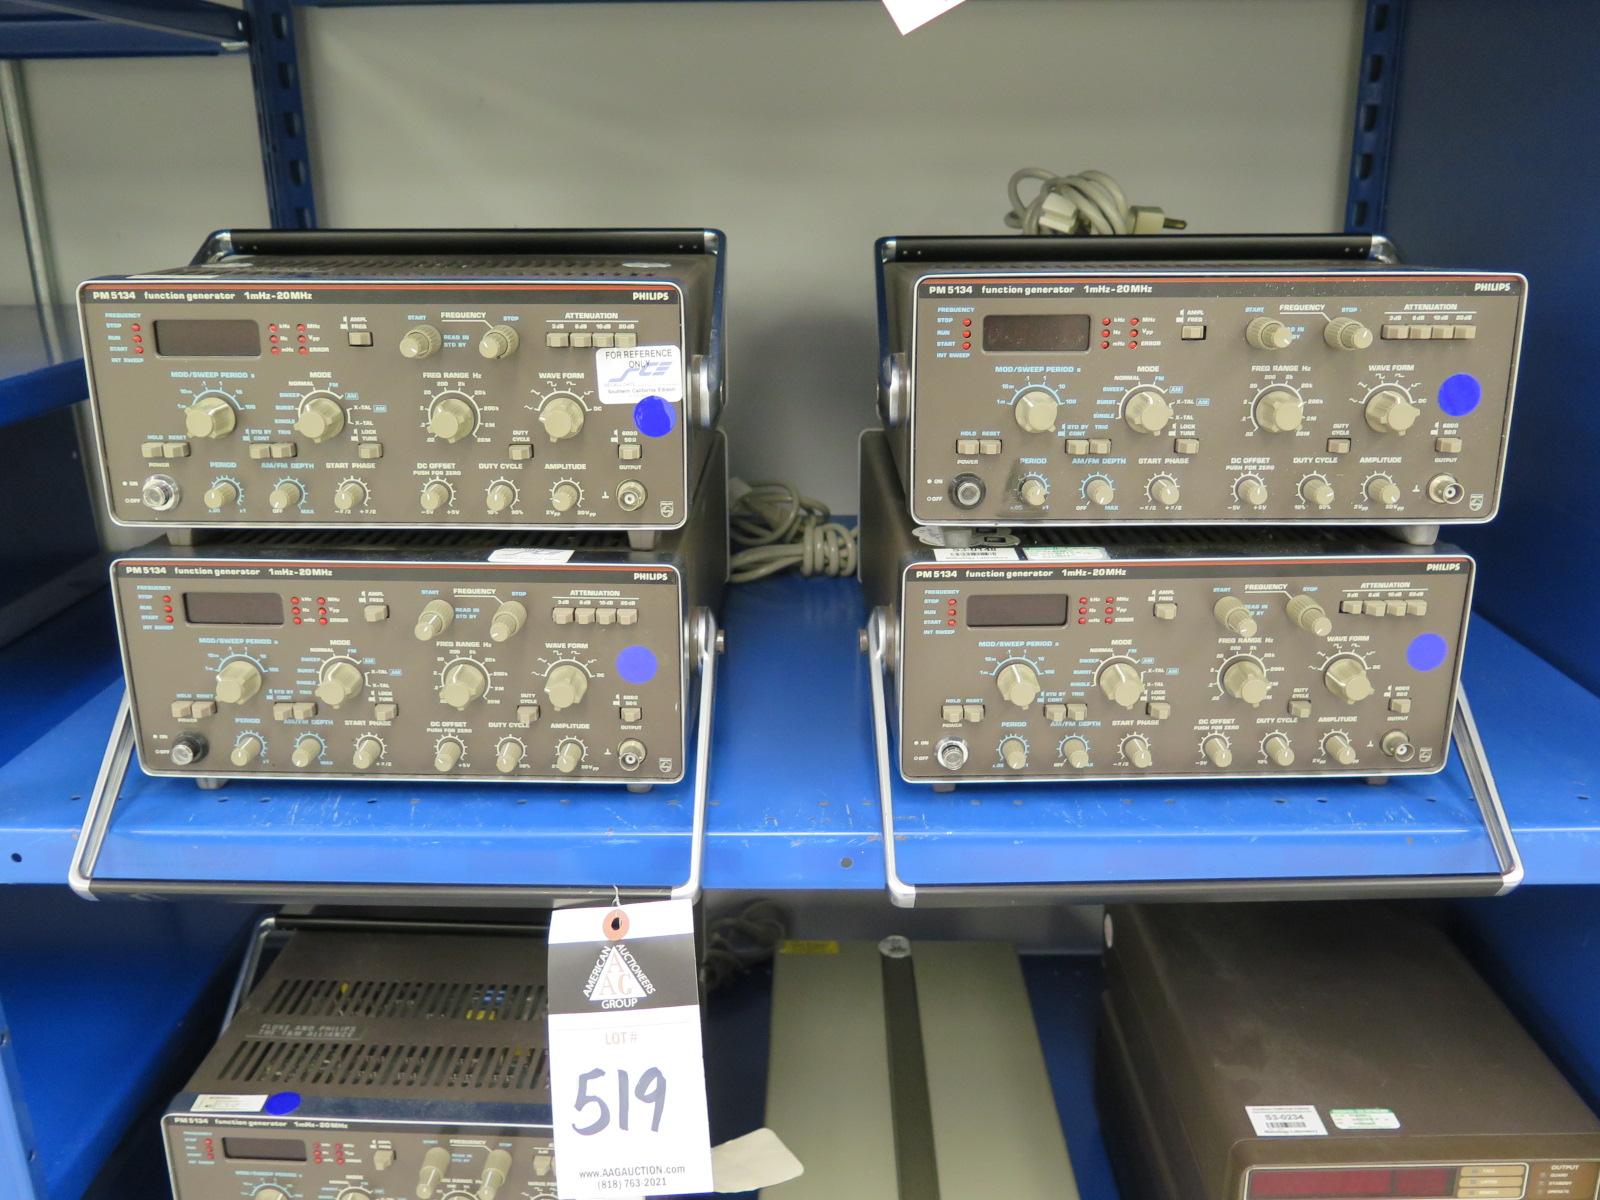 4 Fluke Pm5134 1mhz To 20mhz Function Generators Generator Lot 519